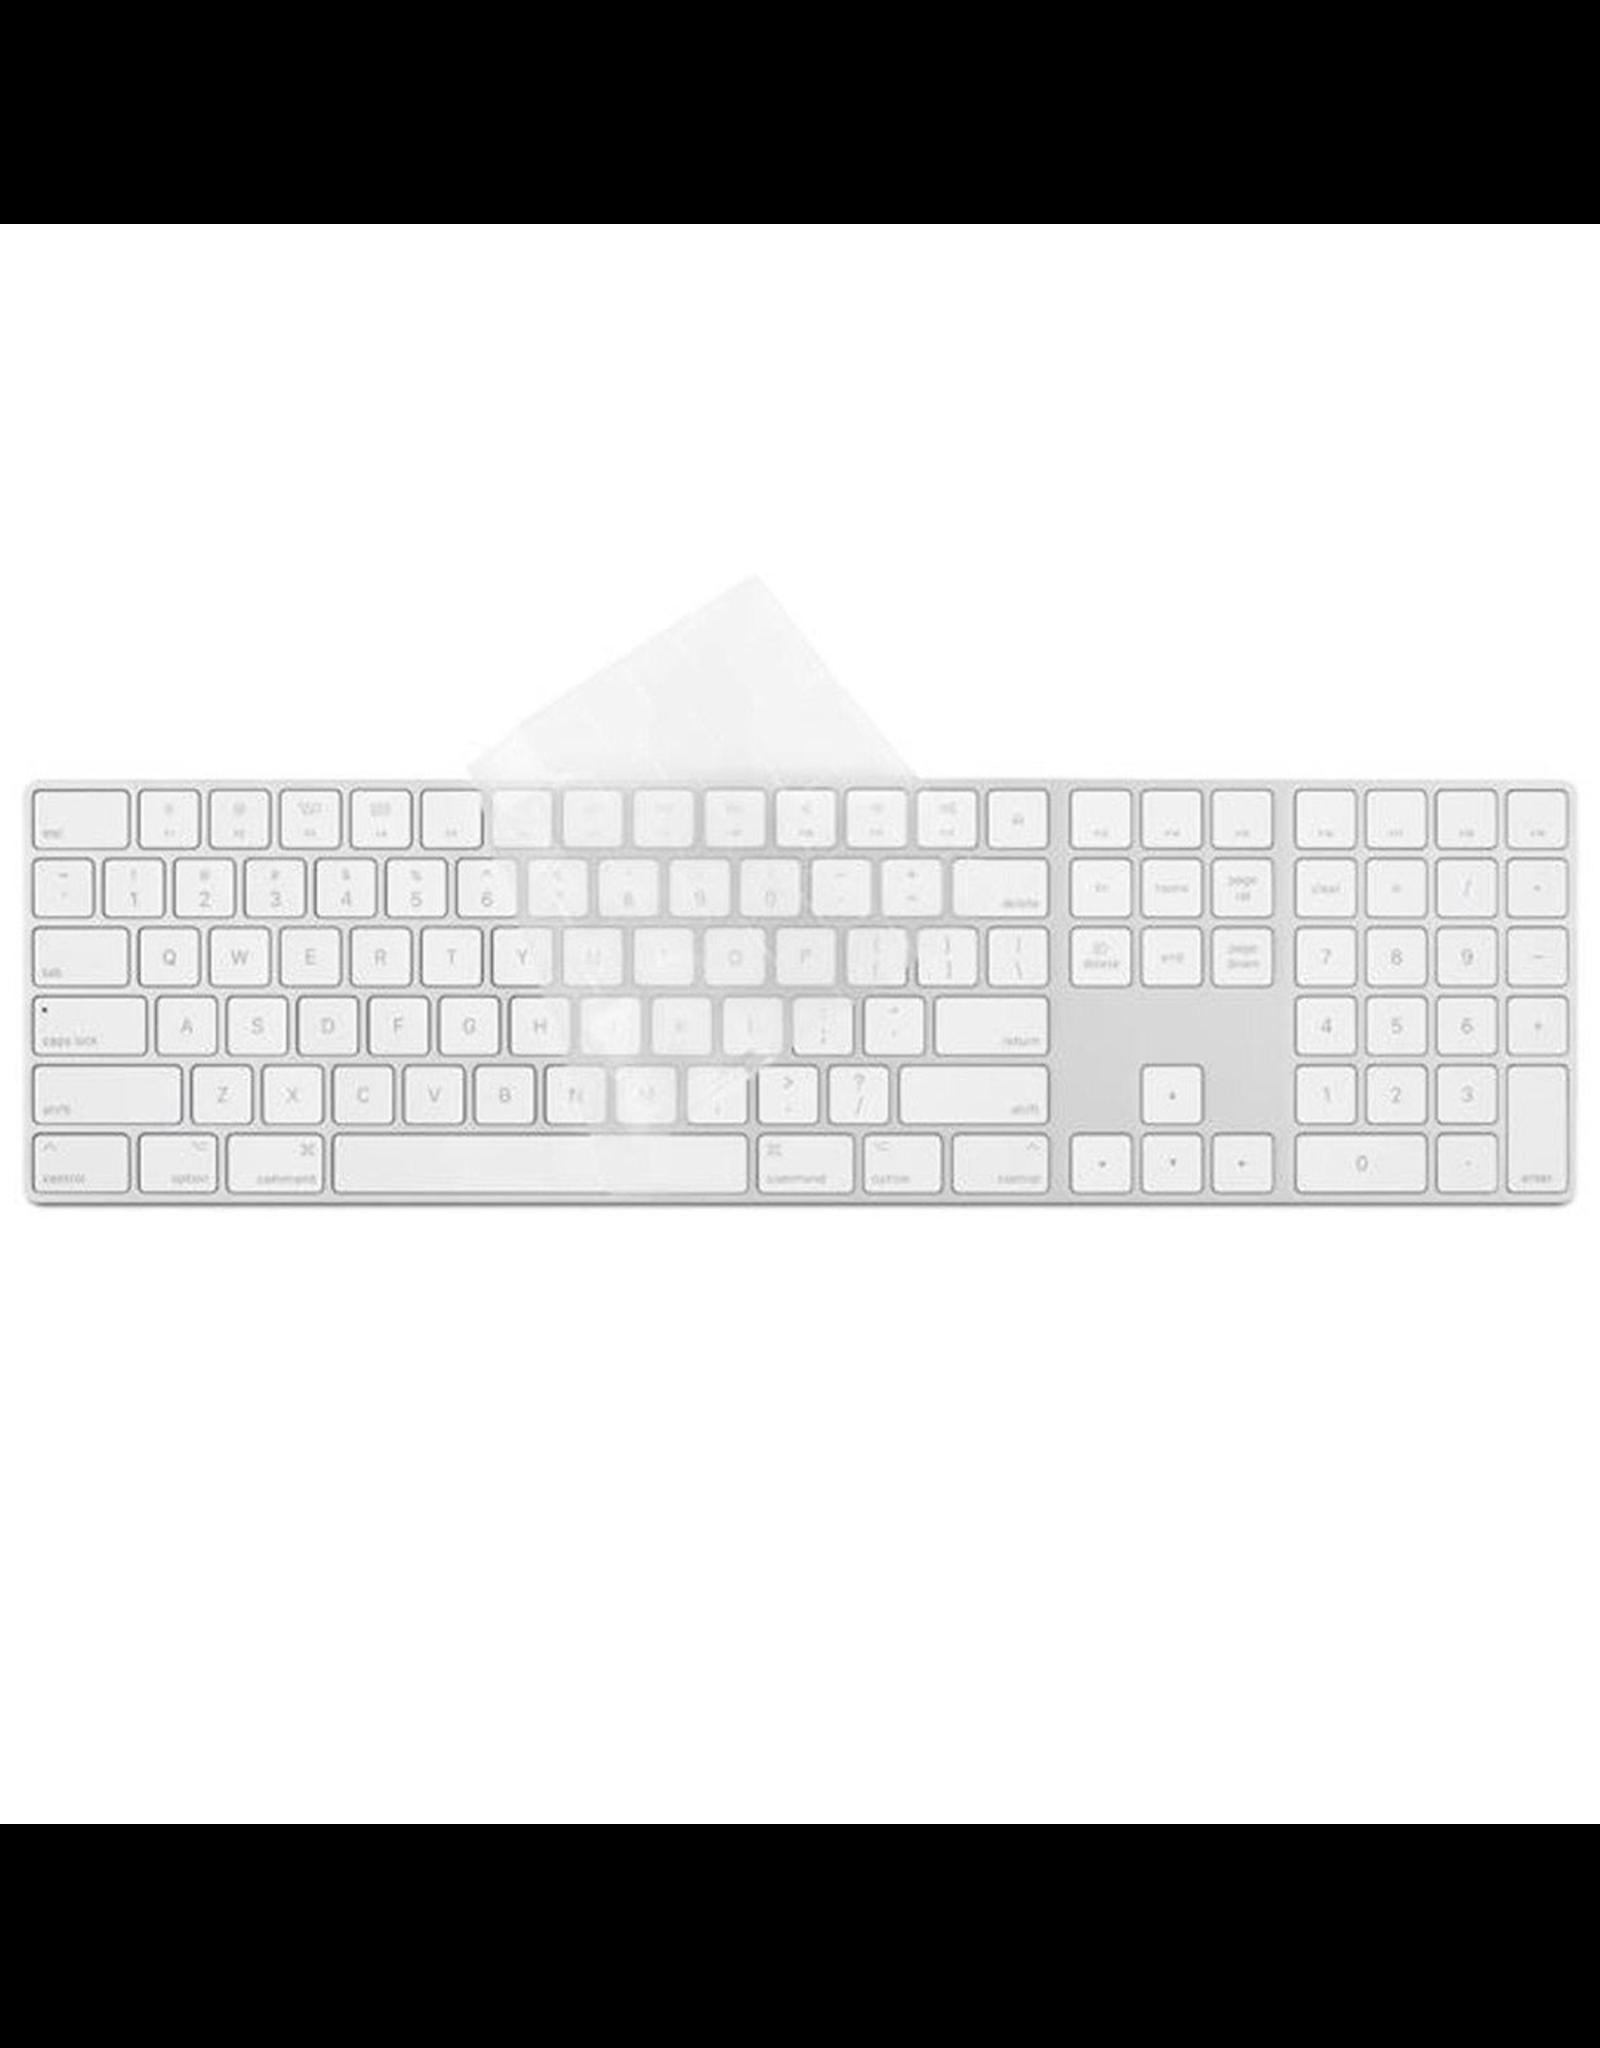 Moshi Moshi Clearguard MK Apple Keyboard Protector with Keypad